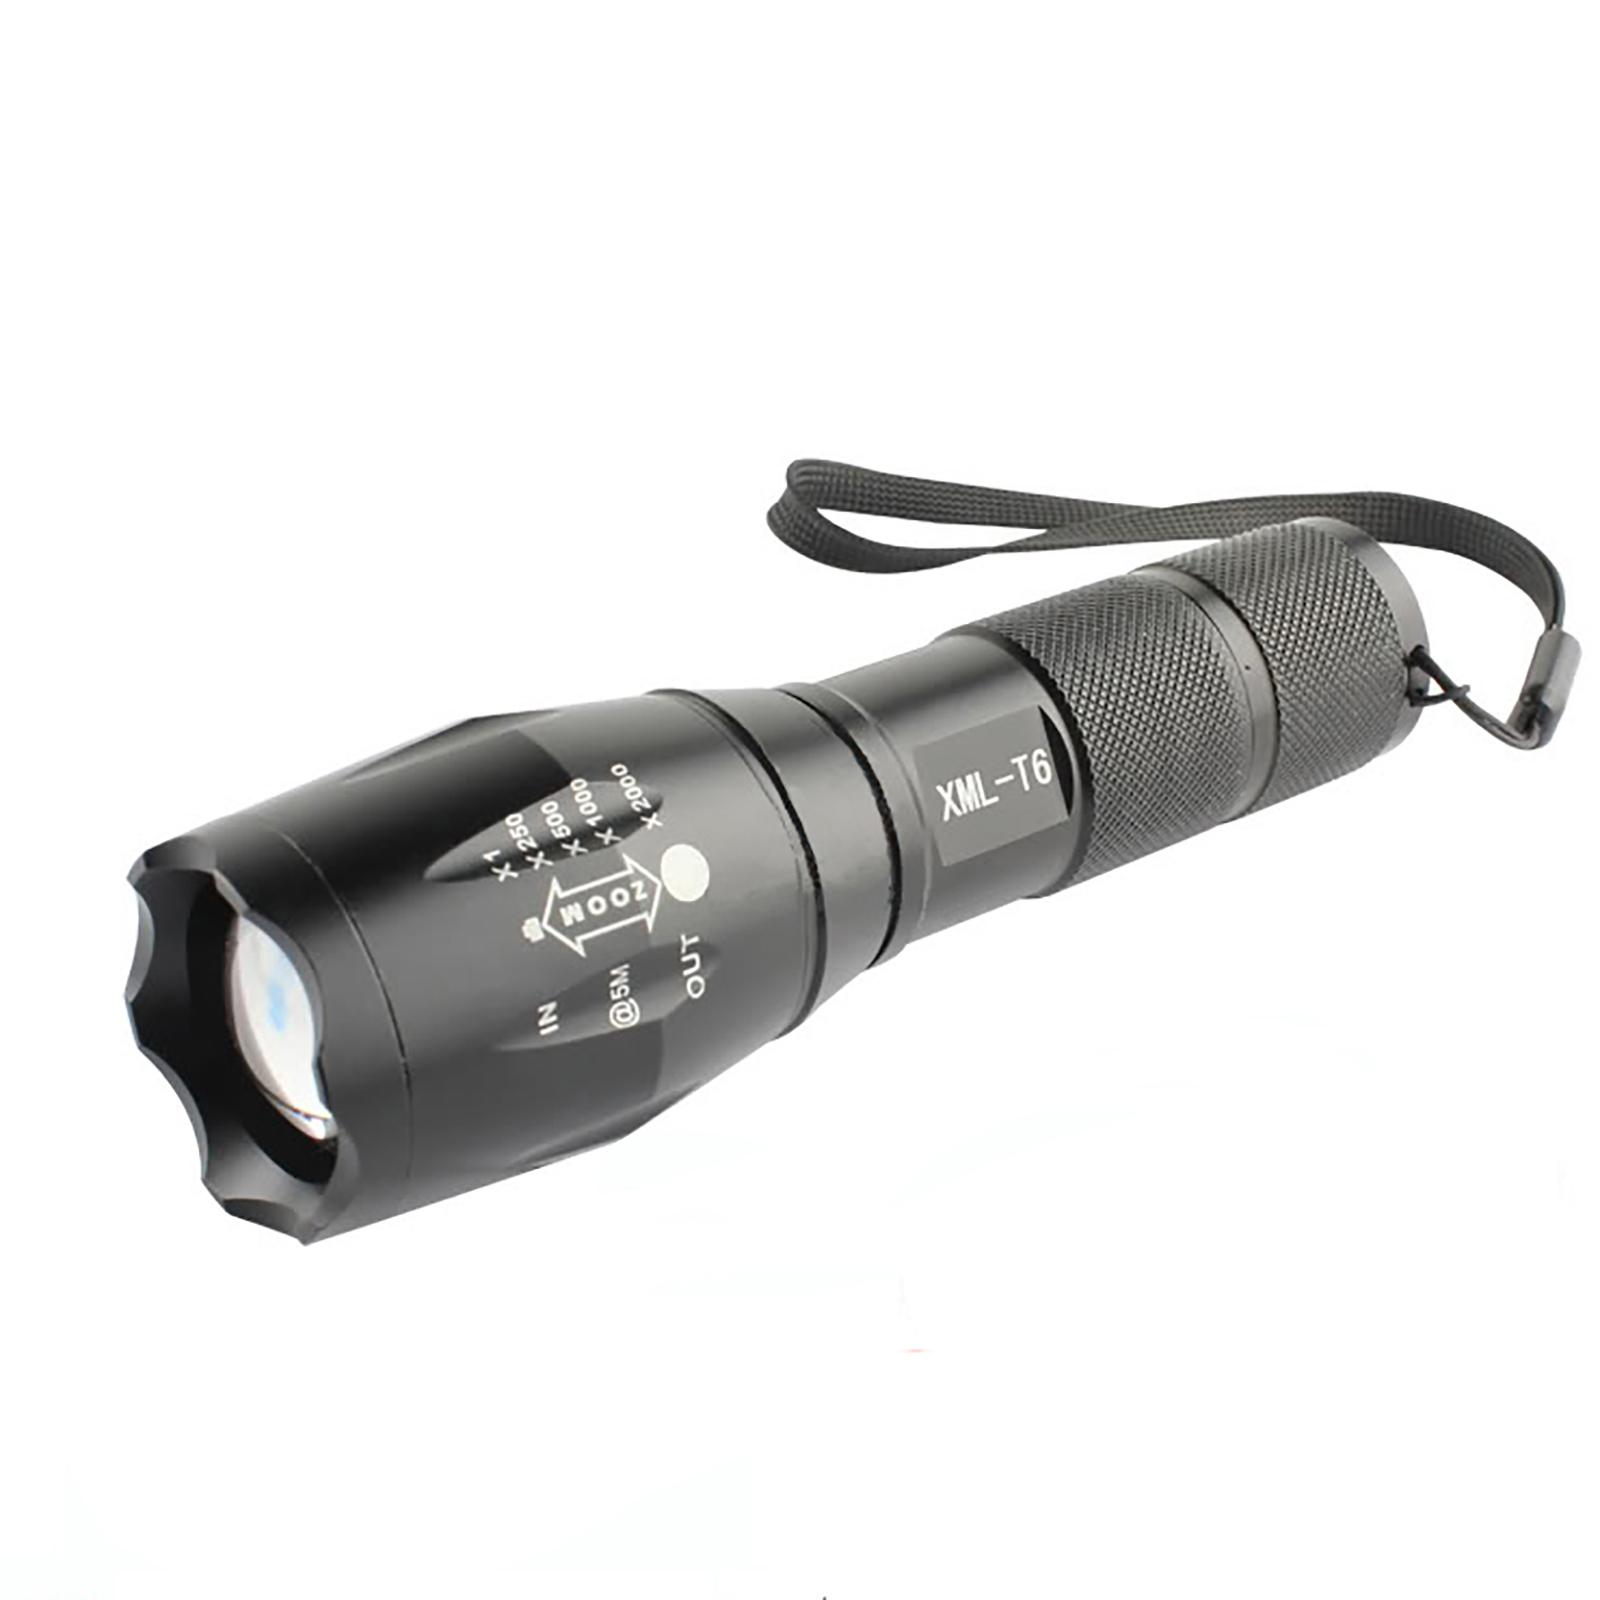 Ultrafire A100 Cree Xml T6